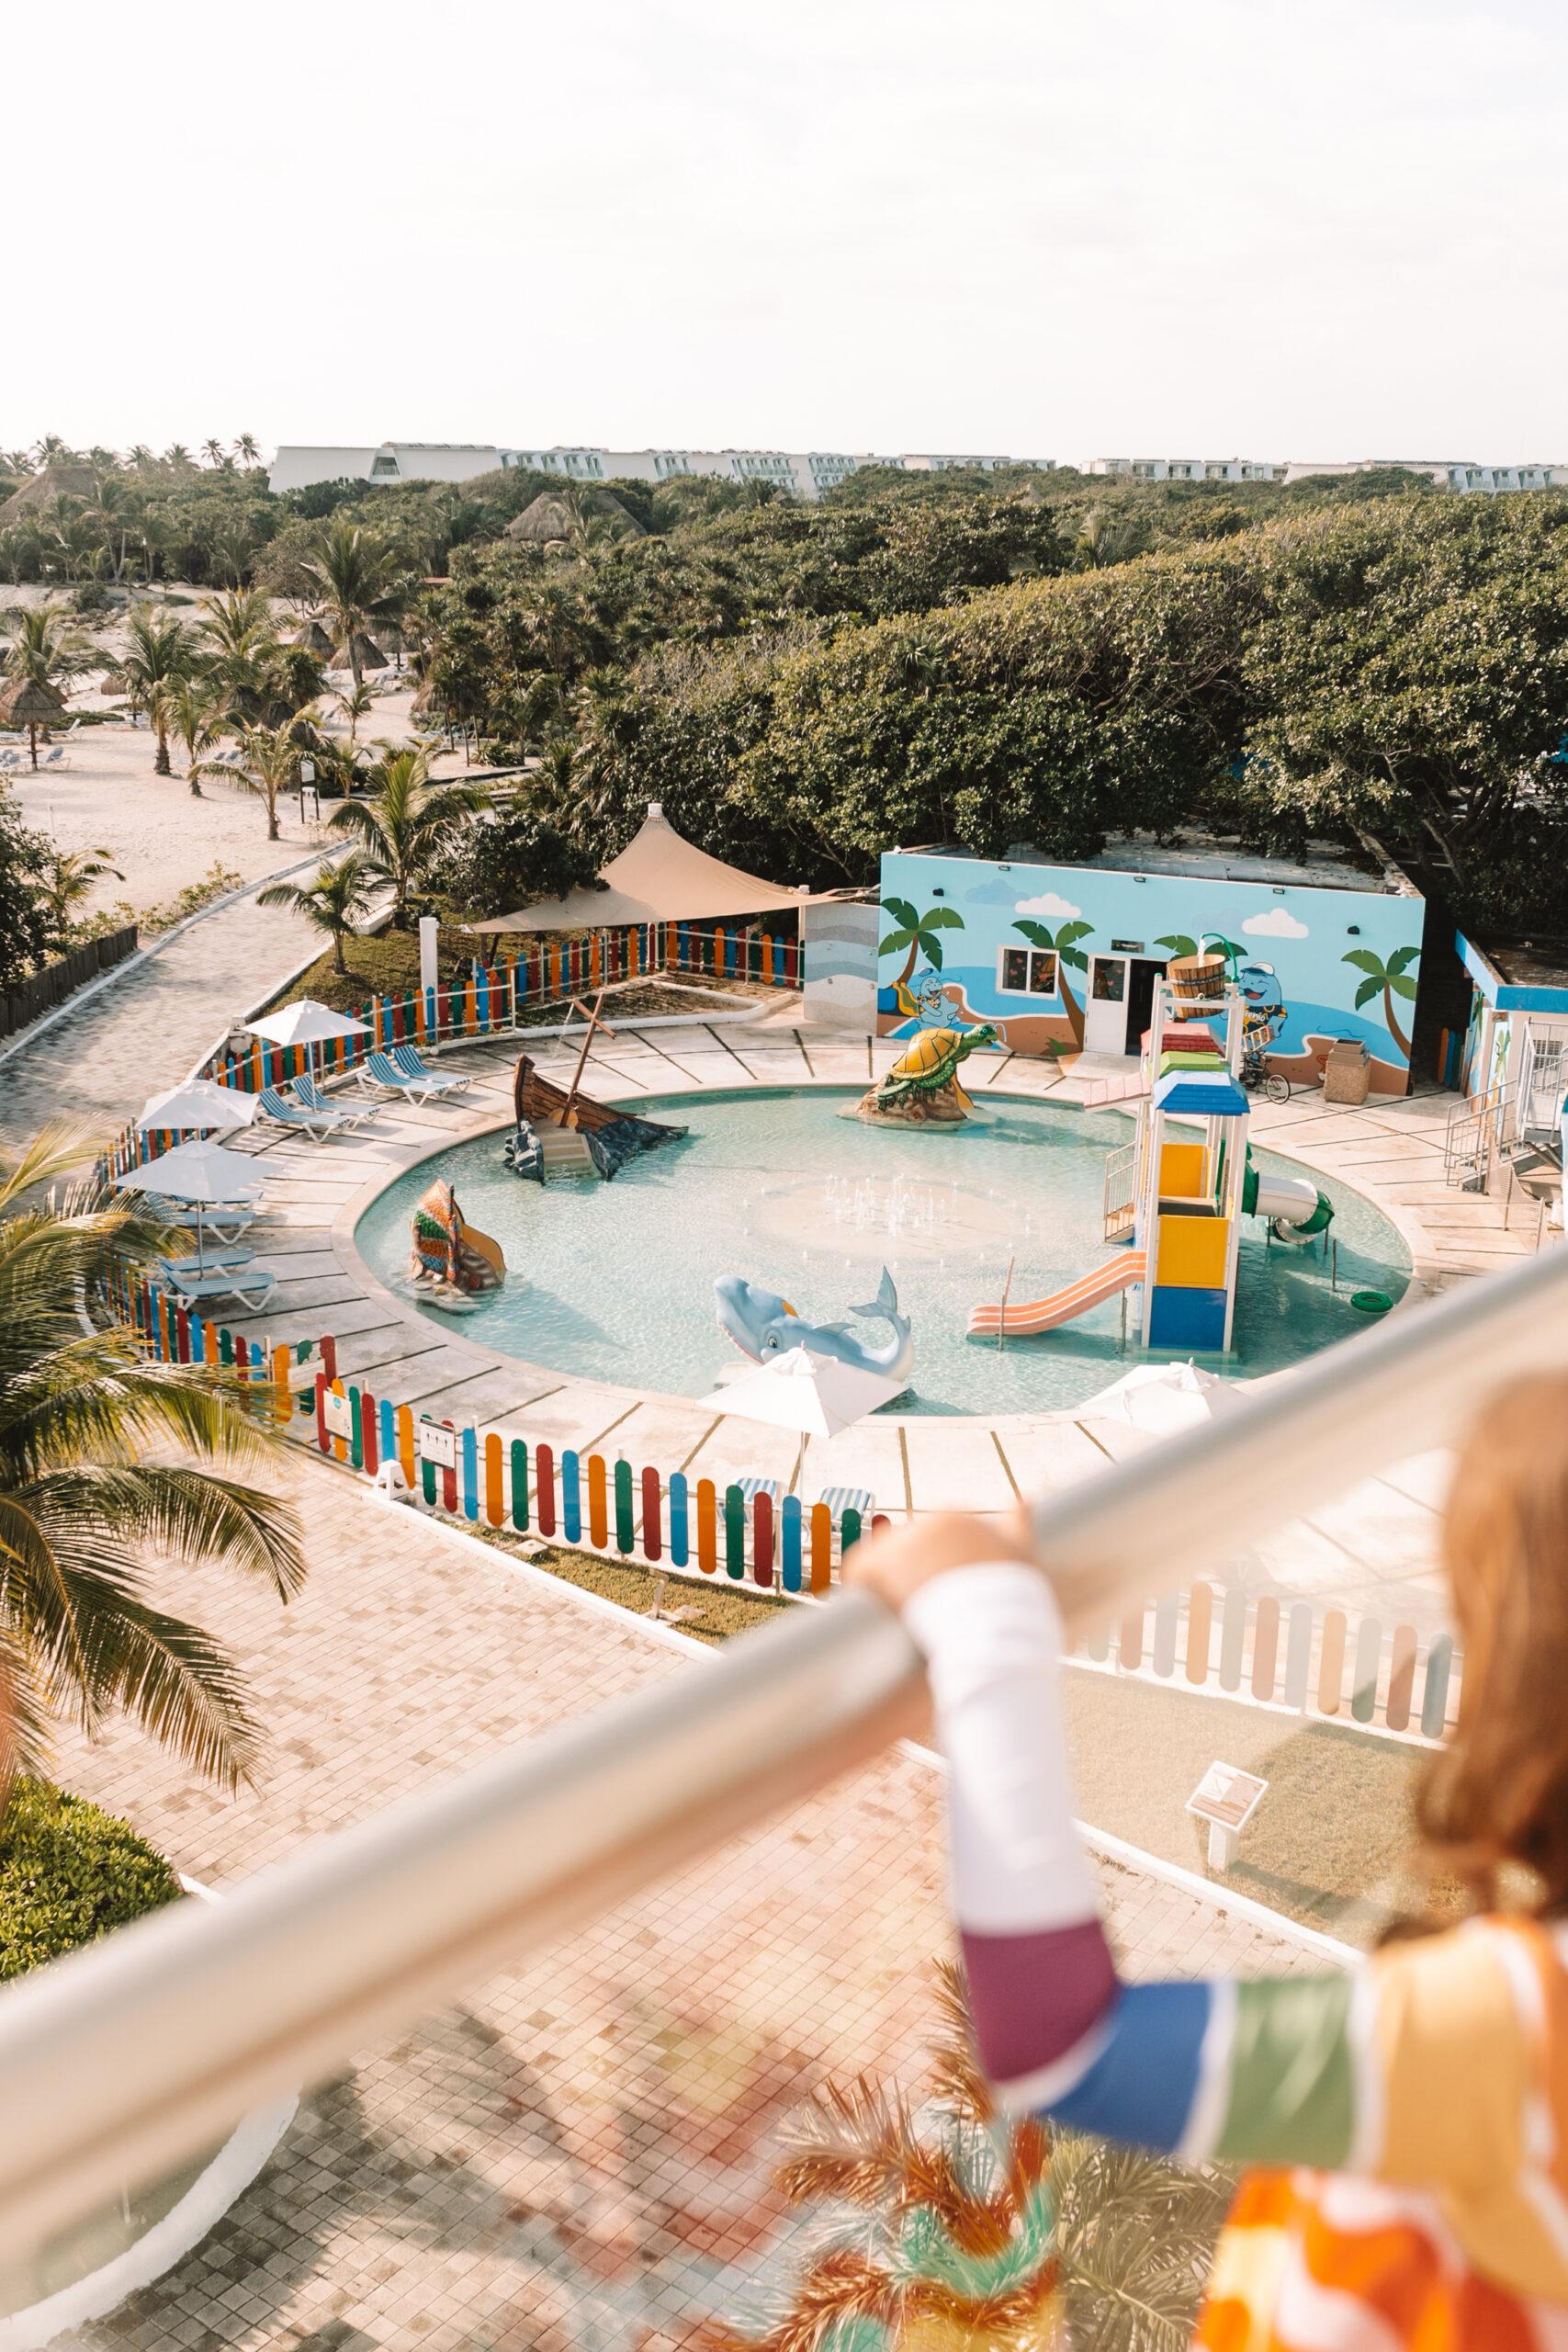 the kids club at the Grand Sirenis Riviera Maya #visitmexico #mexico #rivieramaya #kidsclub